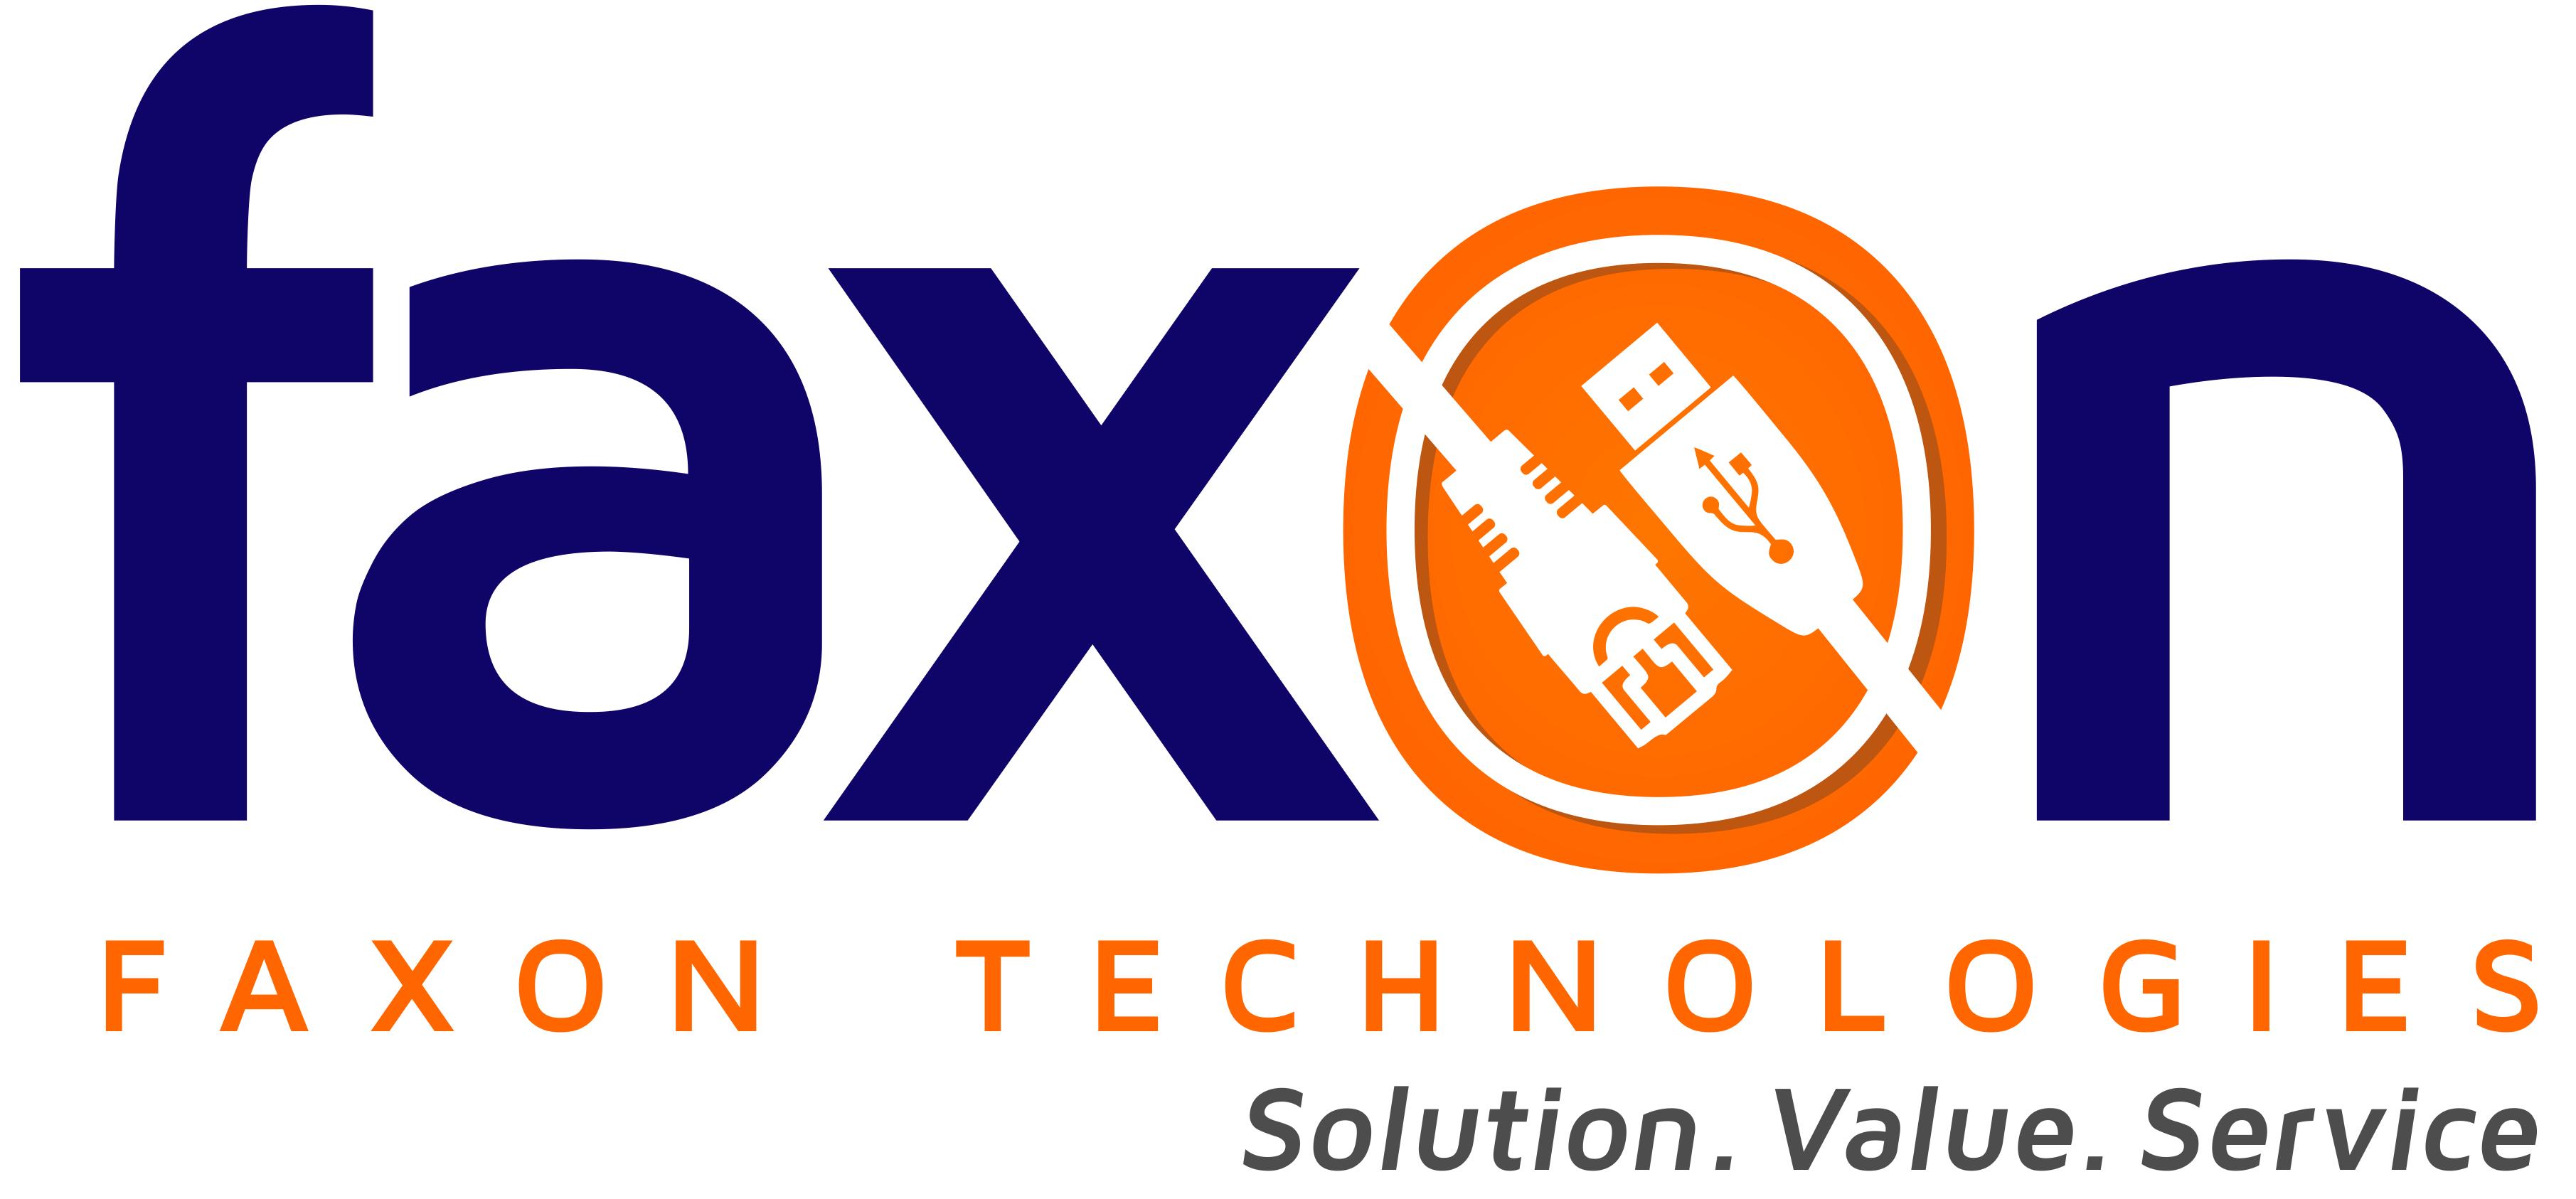 Faxon Technologies